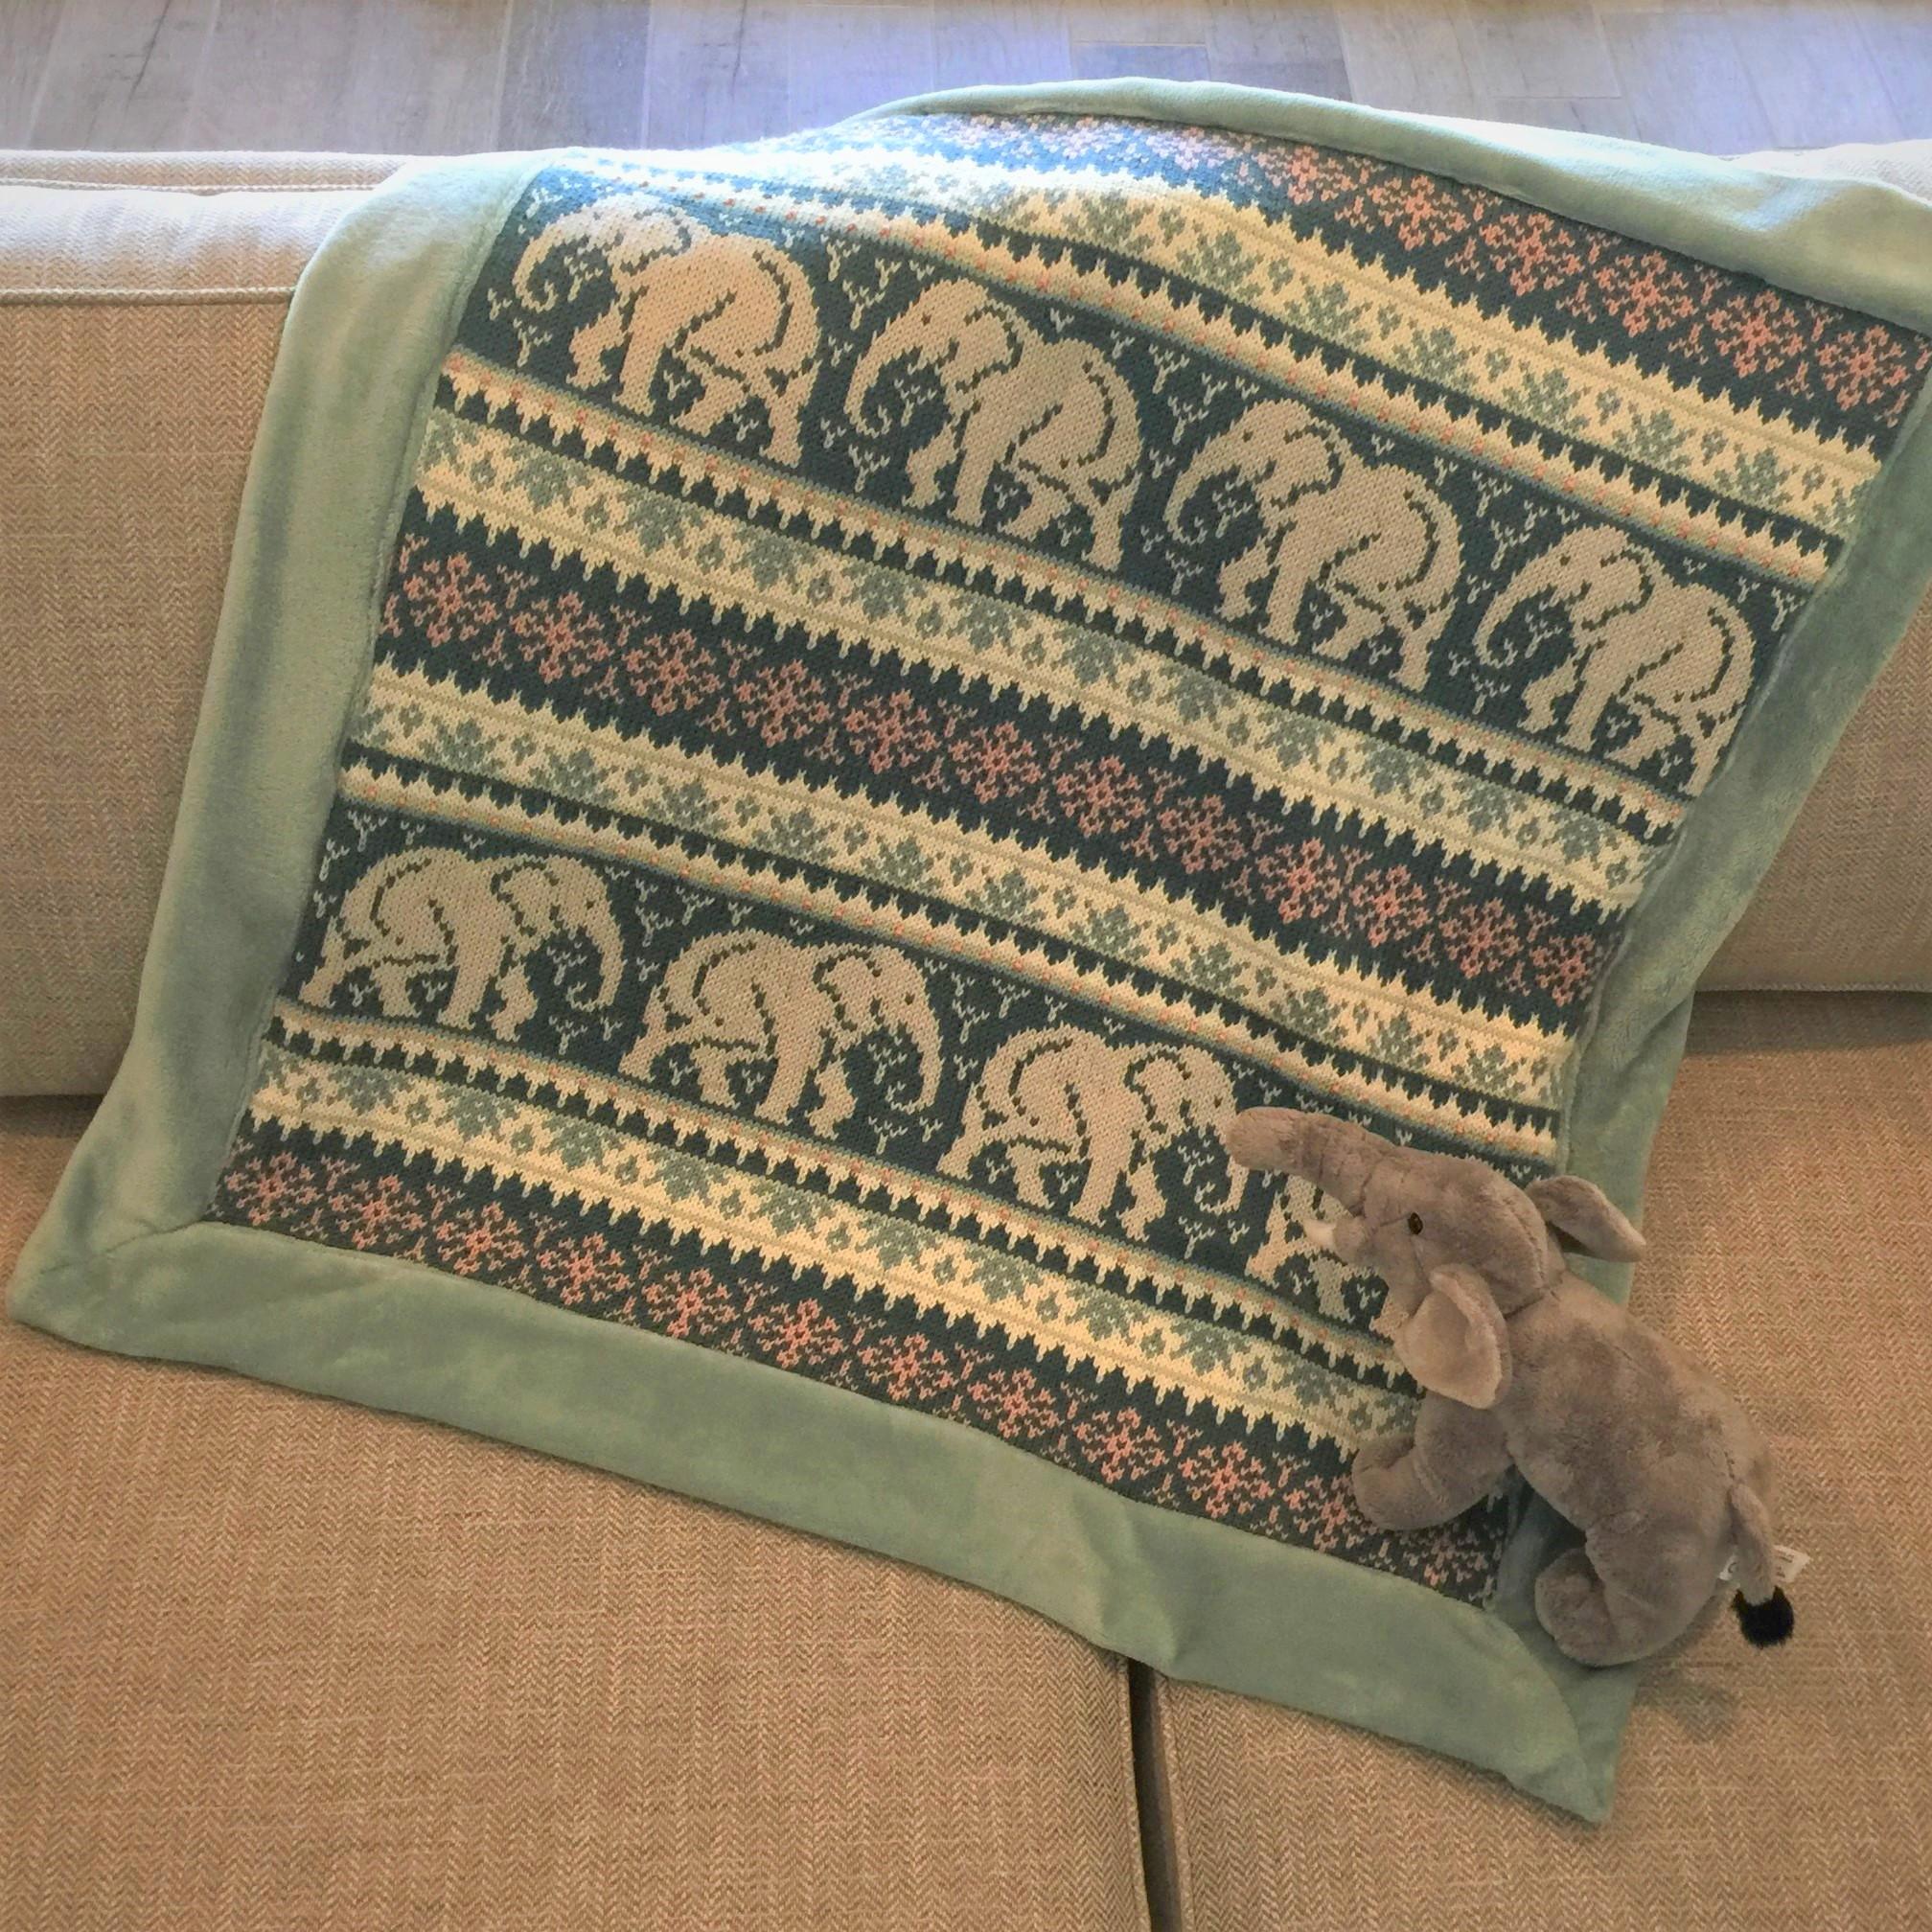 Fair Isle Knitting Patterns Baby Elephant Blanket Knitting Pattern Pdf